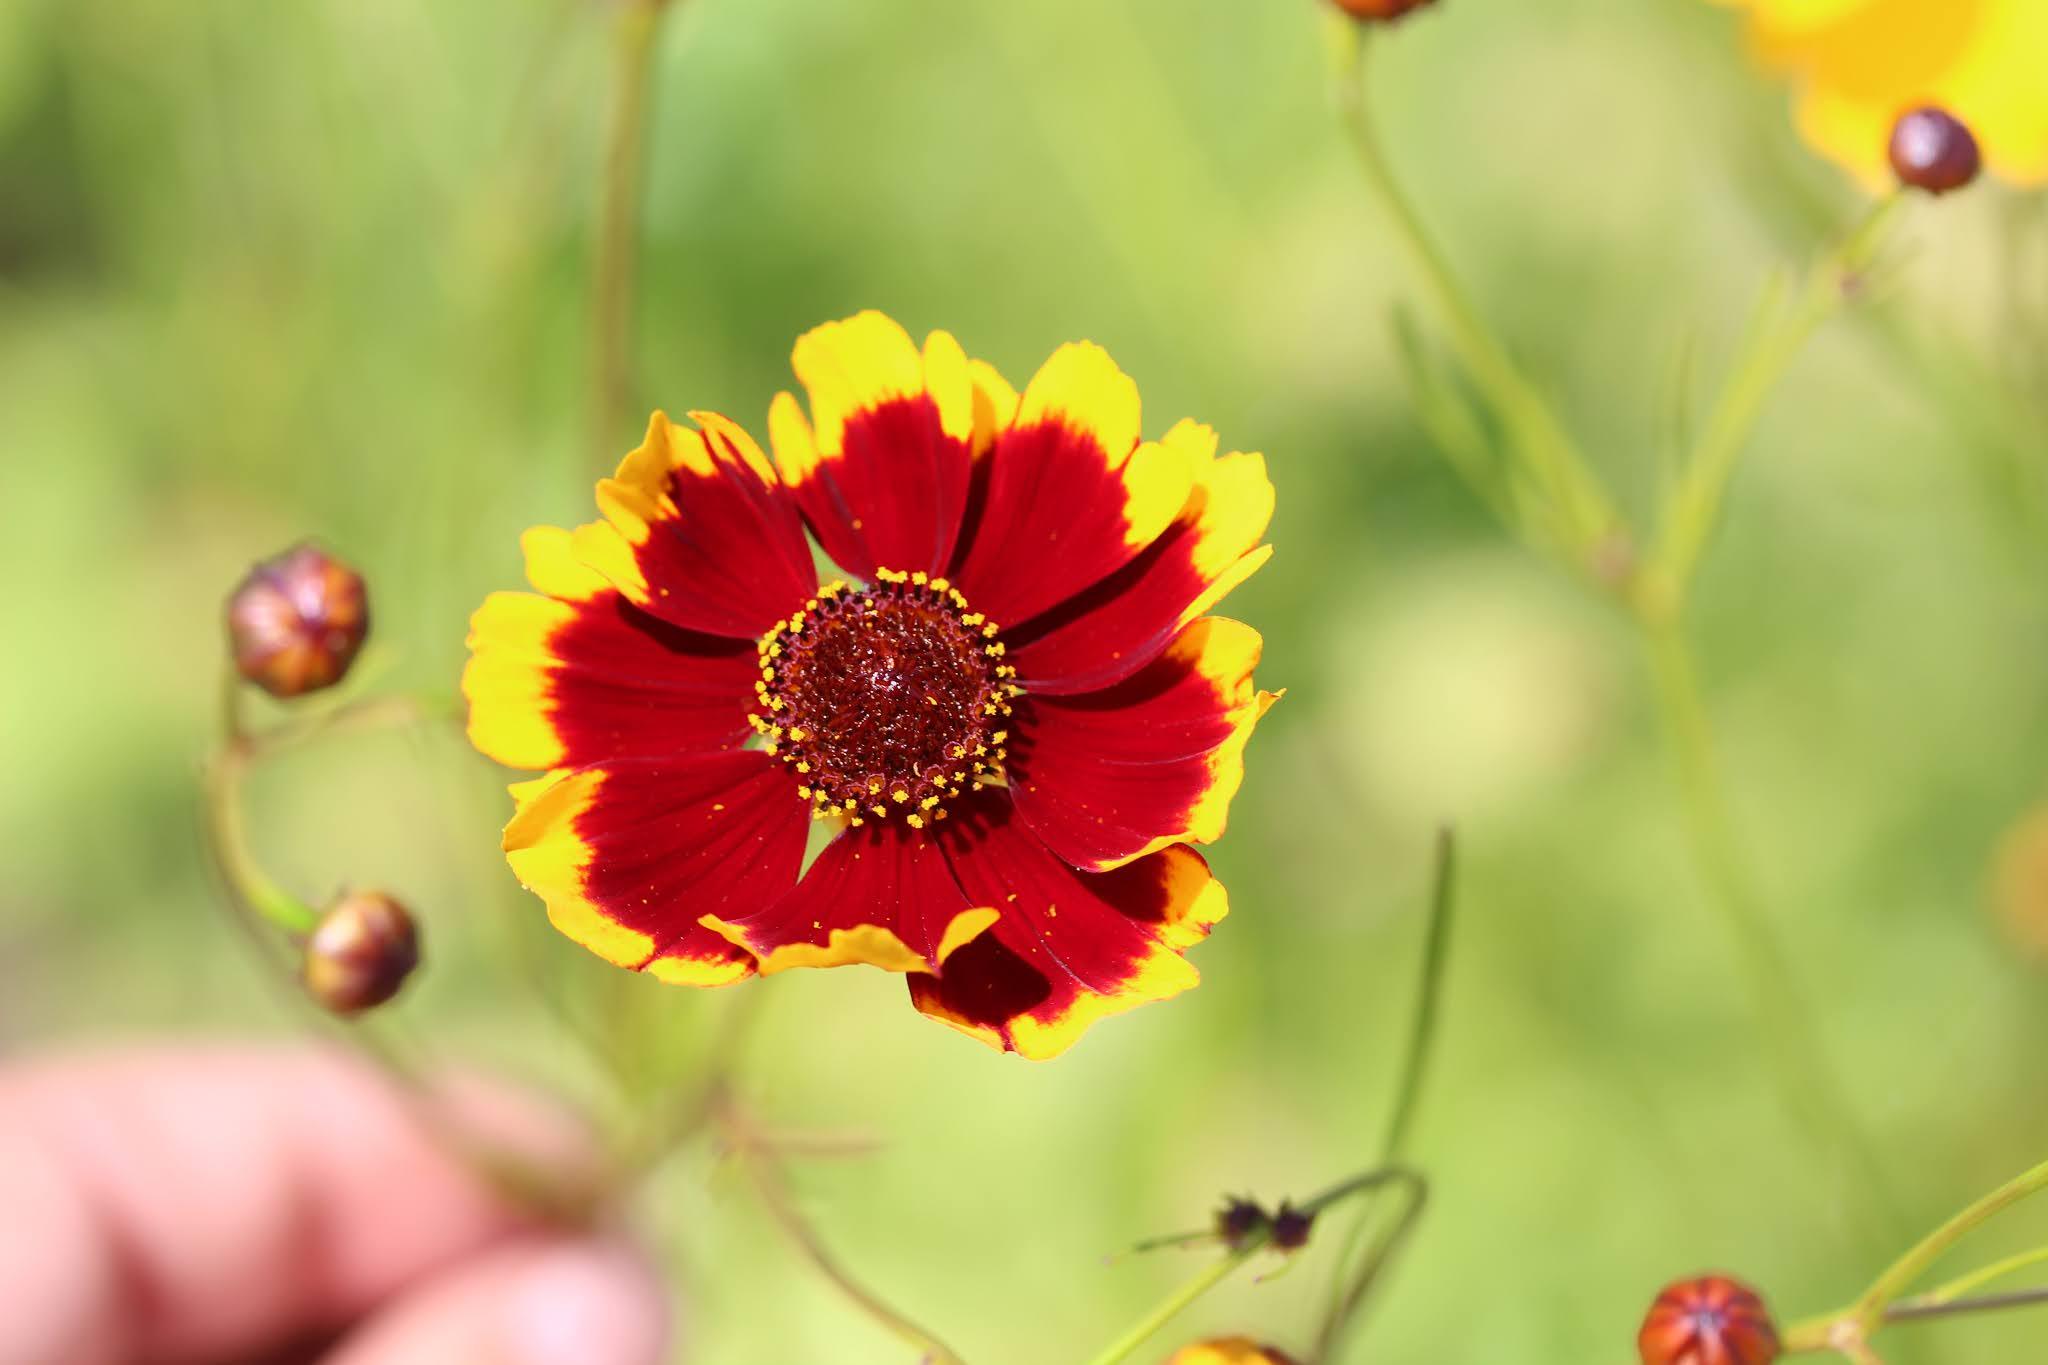 Victory Gardens For Diversity Petal Power A Sneak Peak